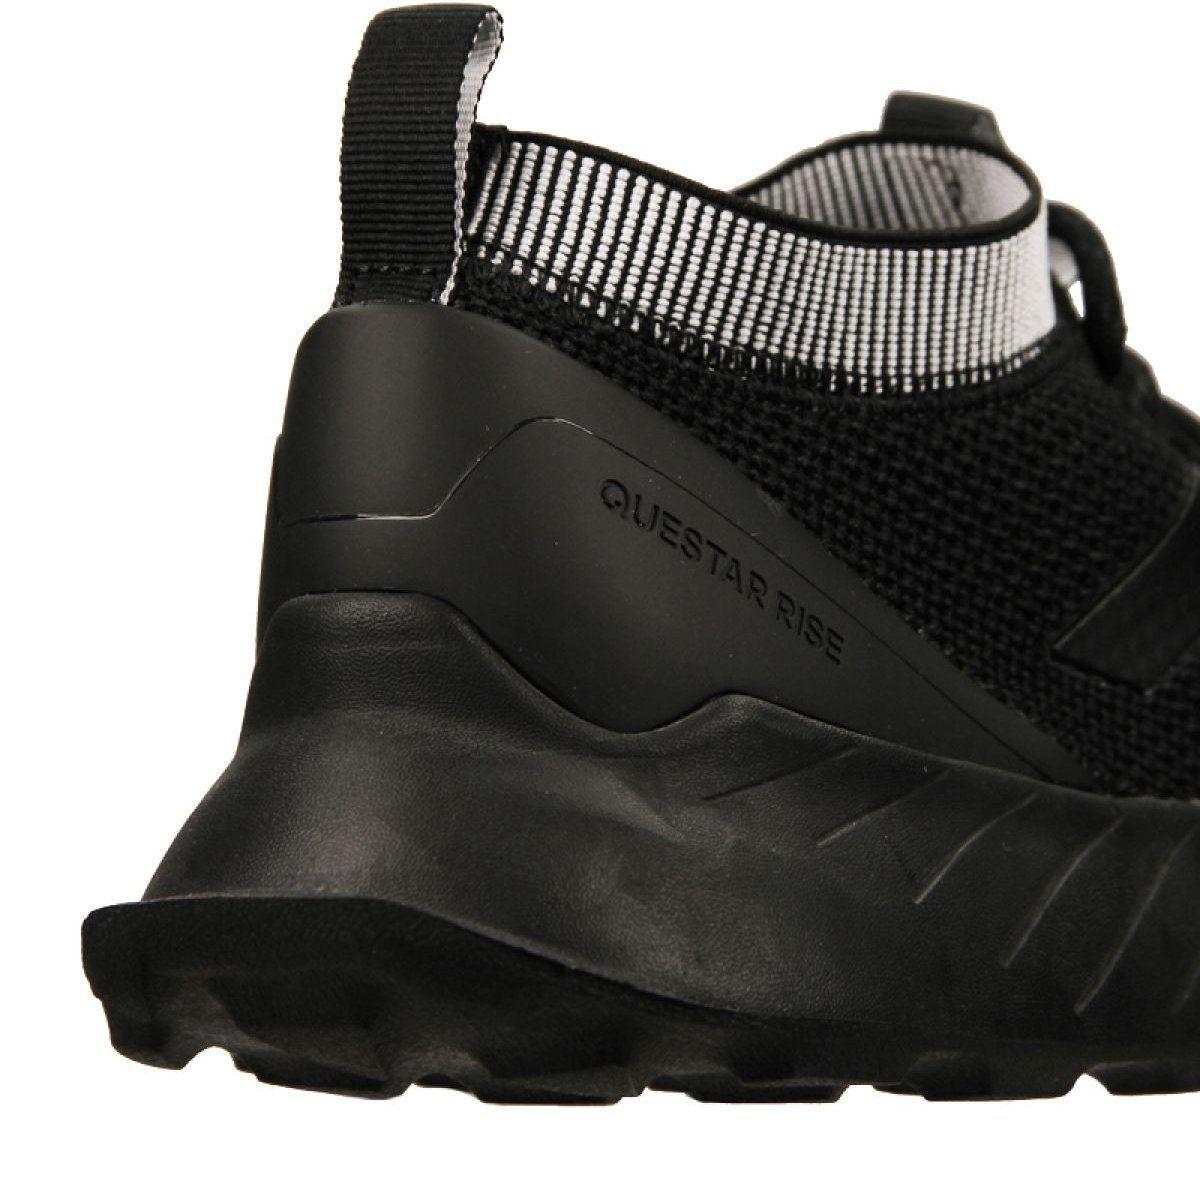 Training Running Sport Adidas Adidas Questar Ride M B44806 Shoes Black Black Shoes Shoes Stand Running Shoes